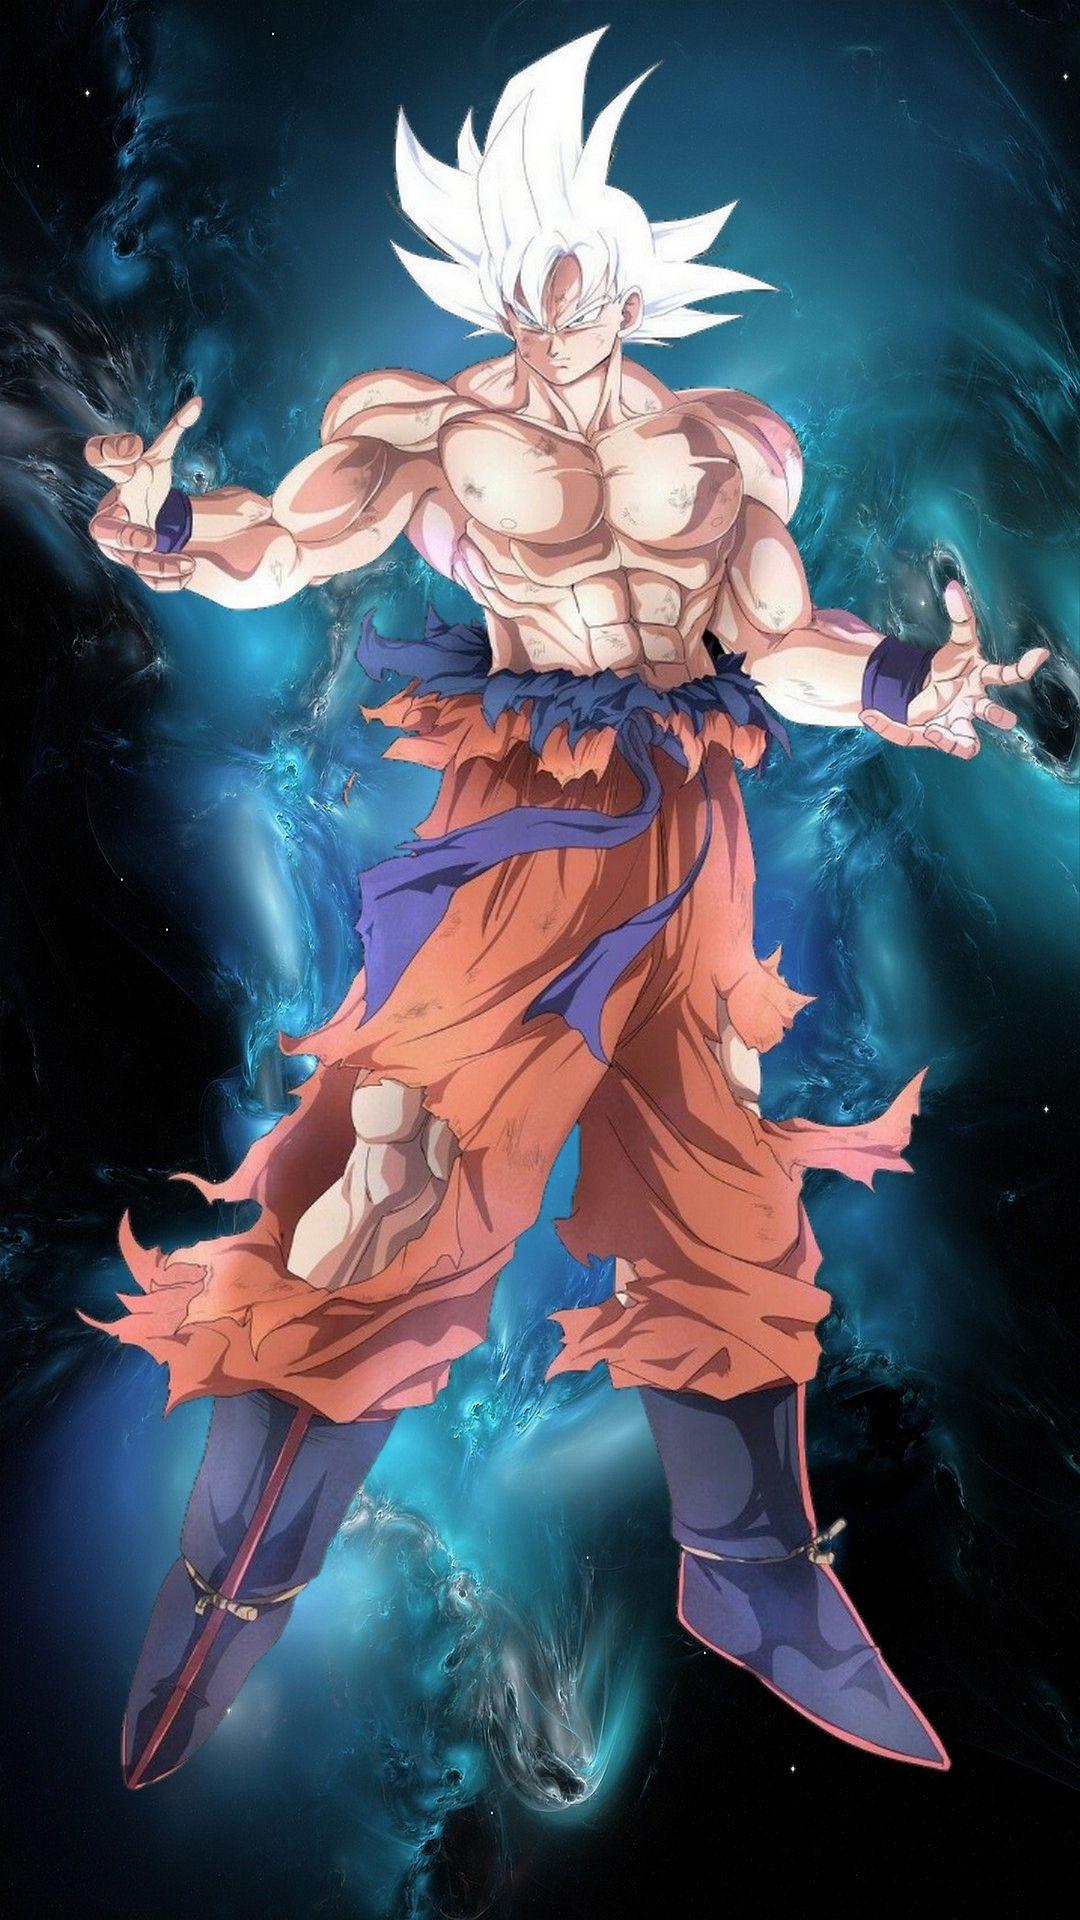 Goku Limit Breaker Anime Dragon Ball Super Anime Dragon Ball Dragon Ball